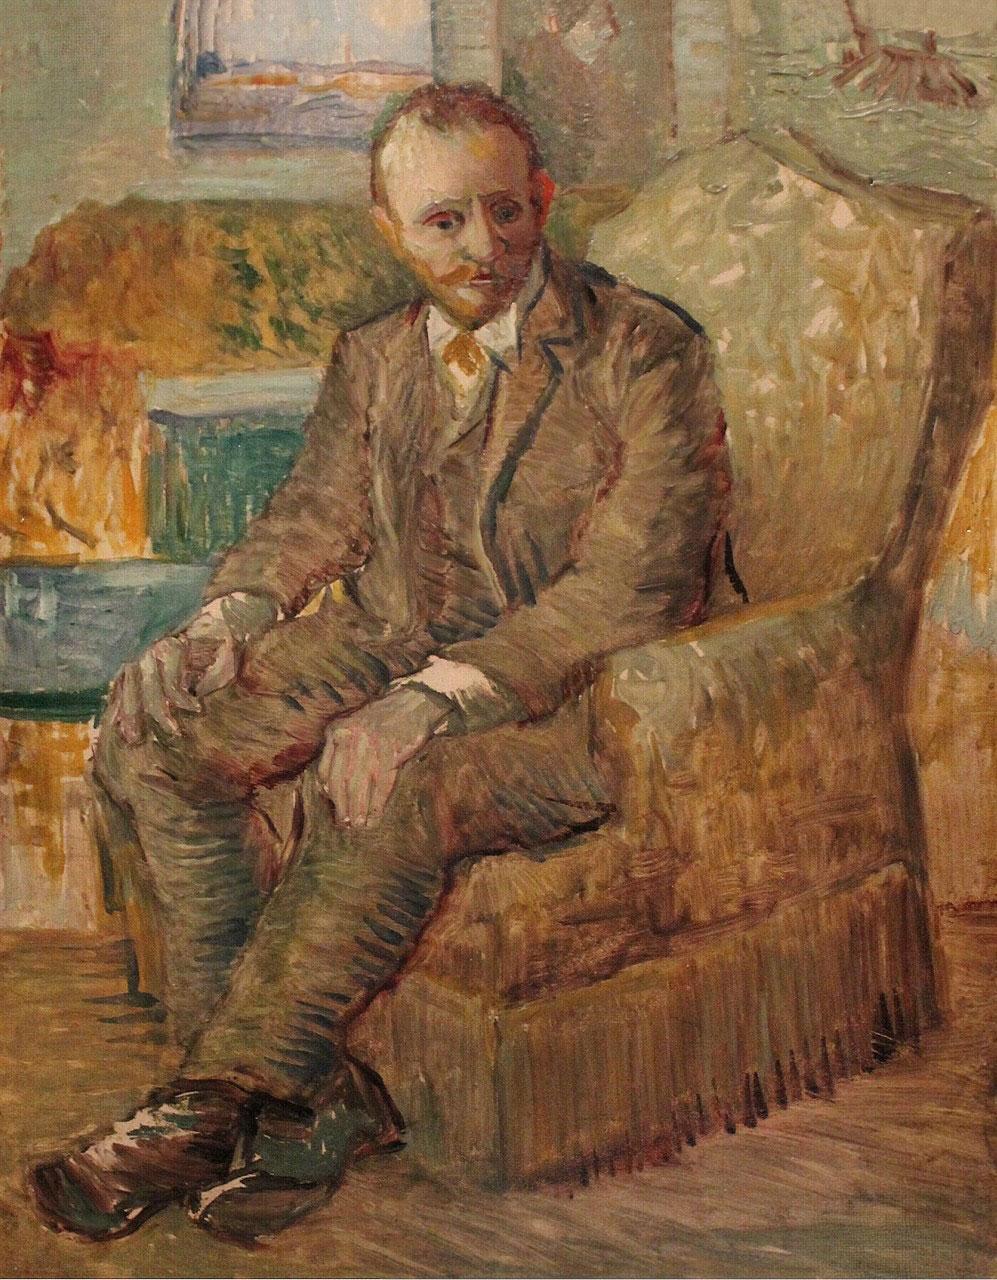 Portrait of art dealer Alexander-Reid sitting in an easy chair